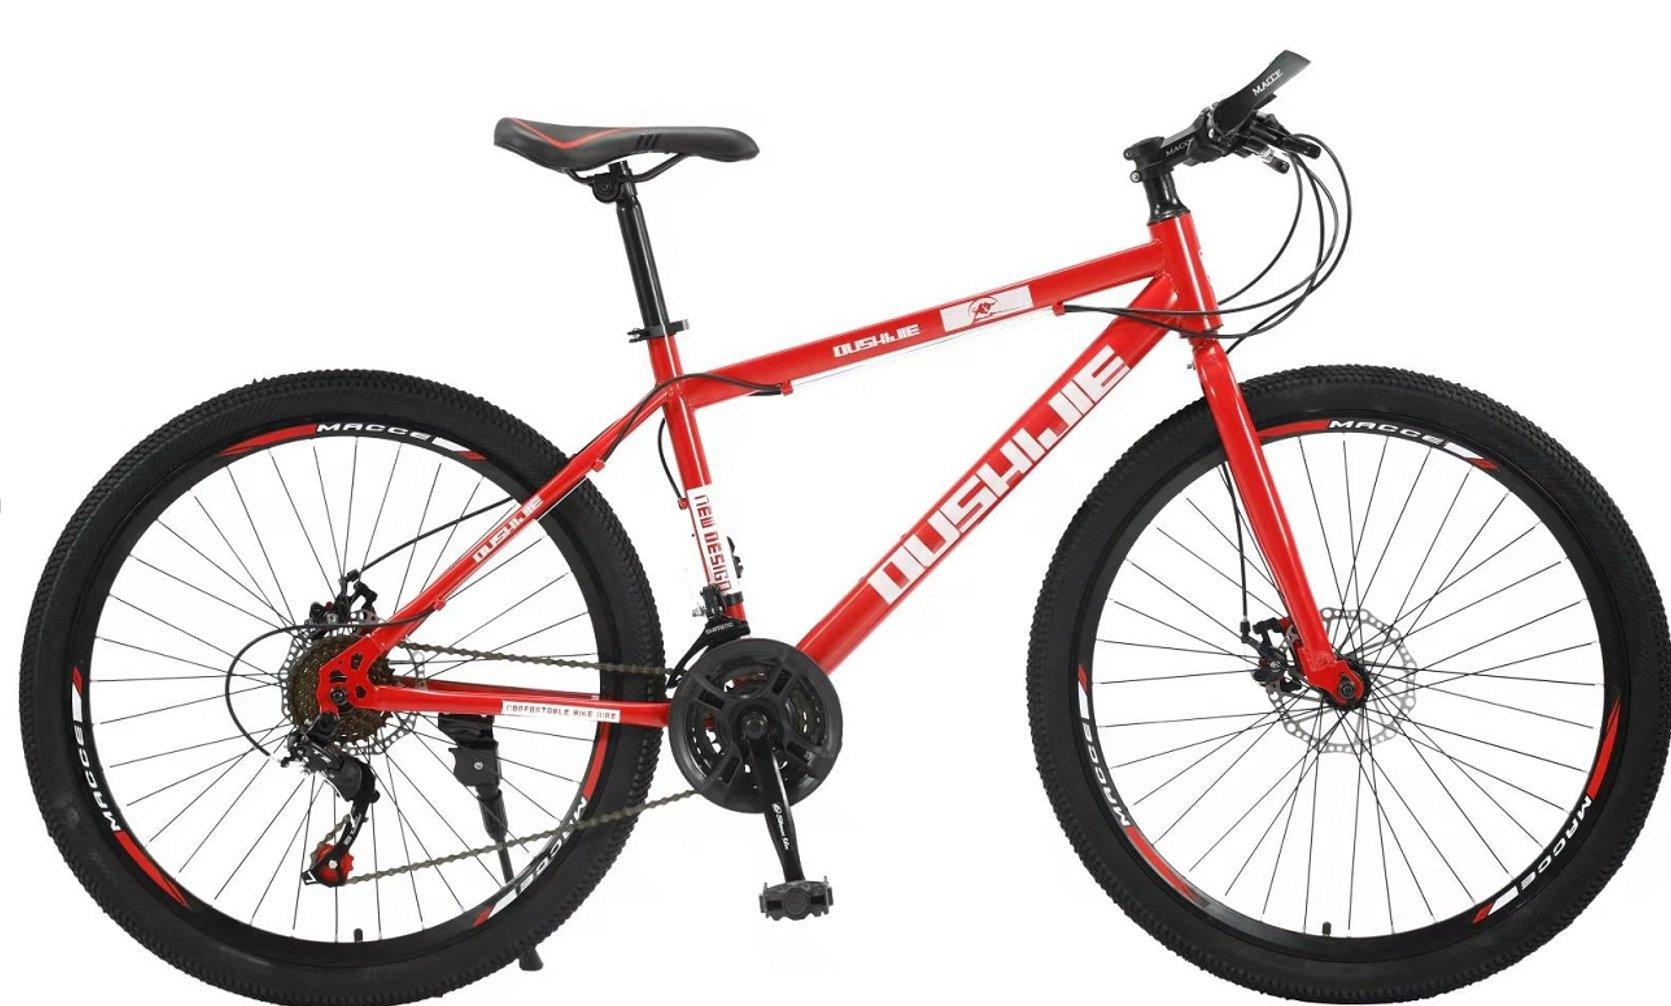 24-inch 26-inch Jaugar spoke wheels mountain bike red 21, 24, 27 speed